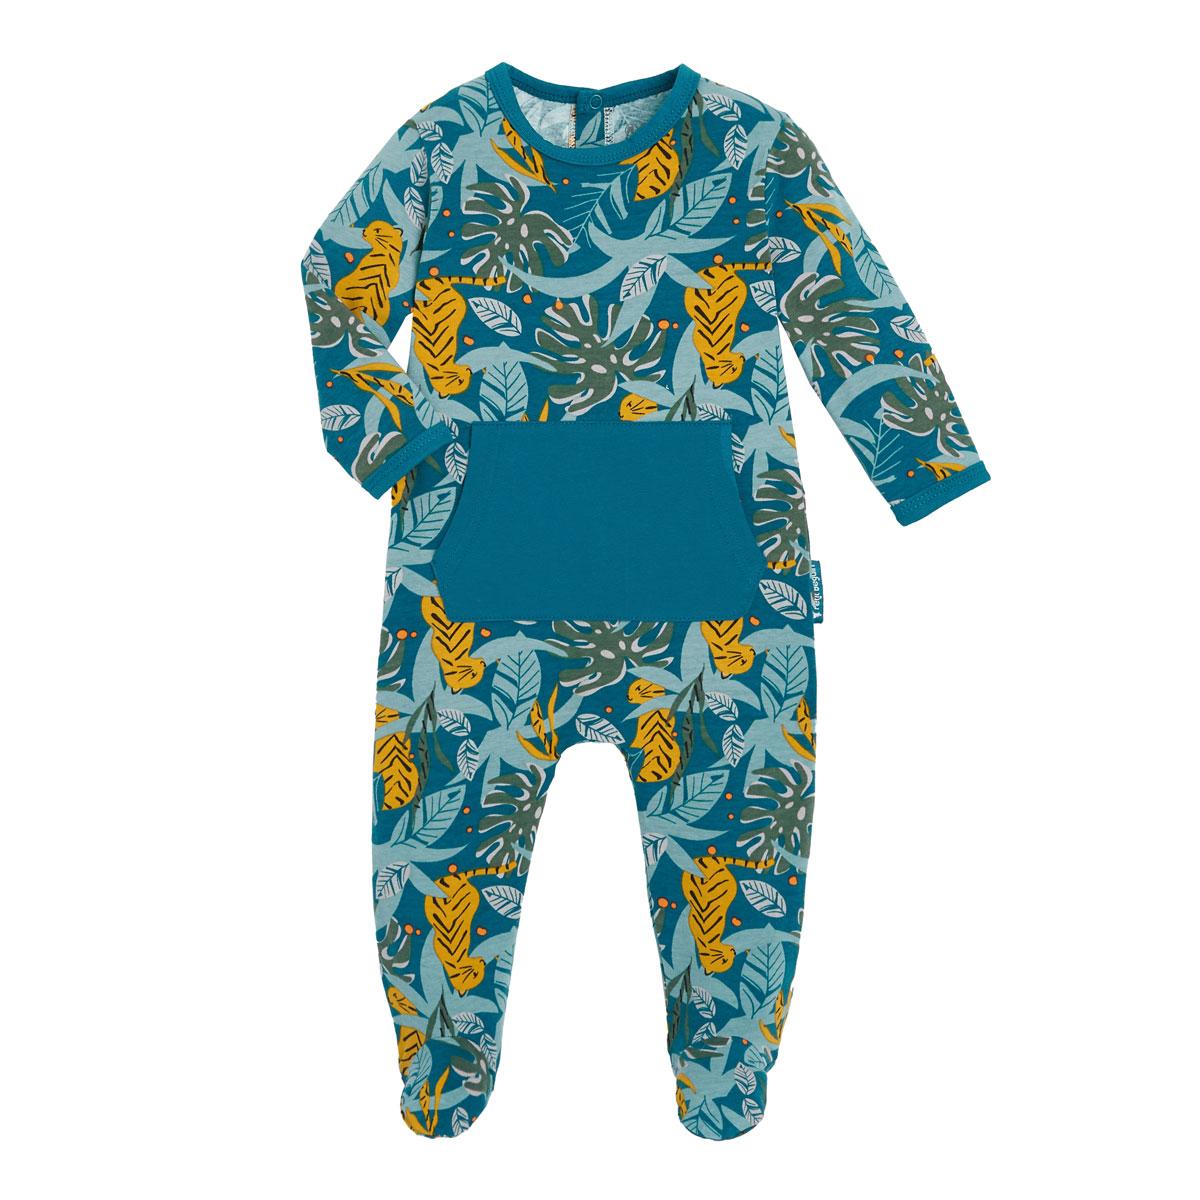 Pyjama bébé contenant du coton bio Malawi